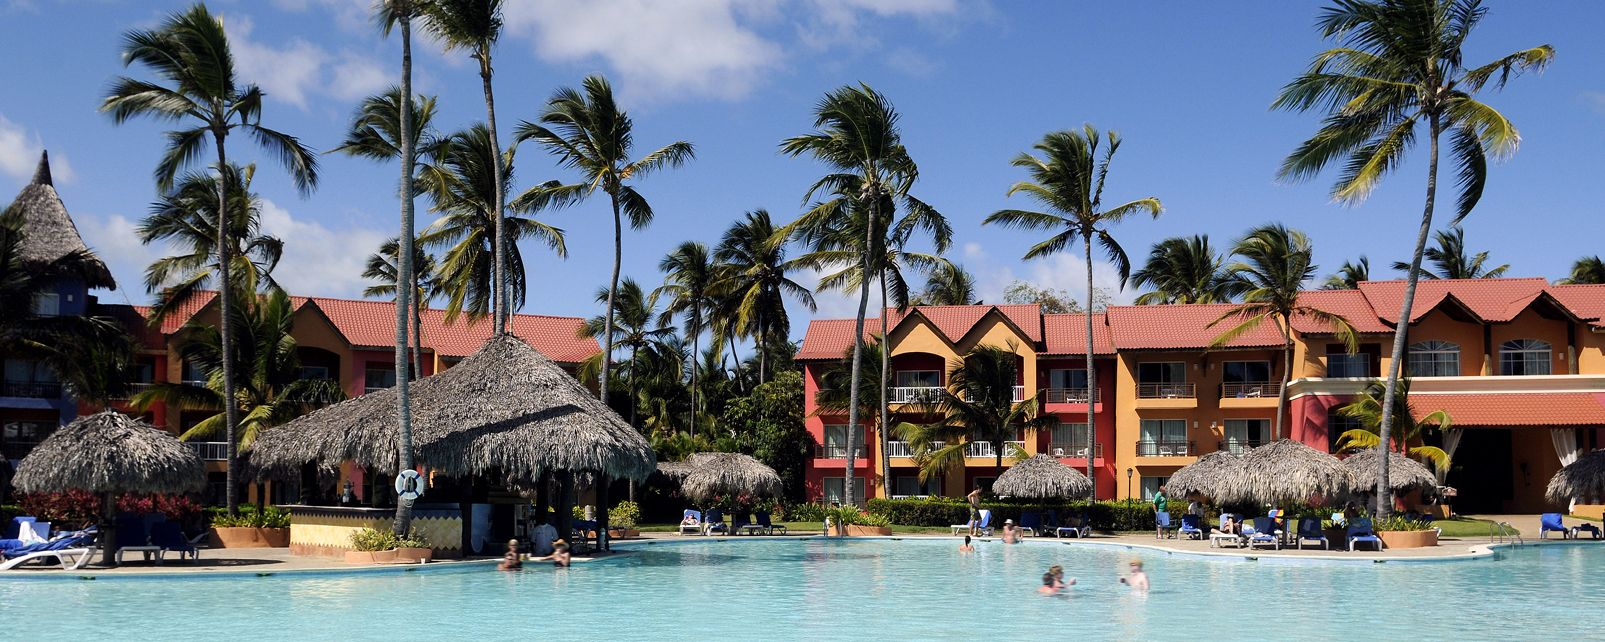 Hotel Punta Cana Princess